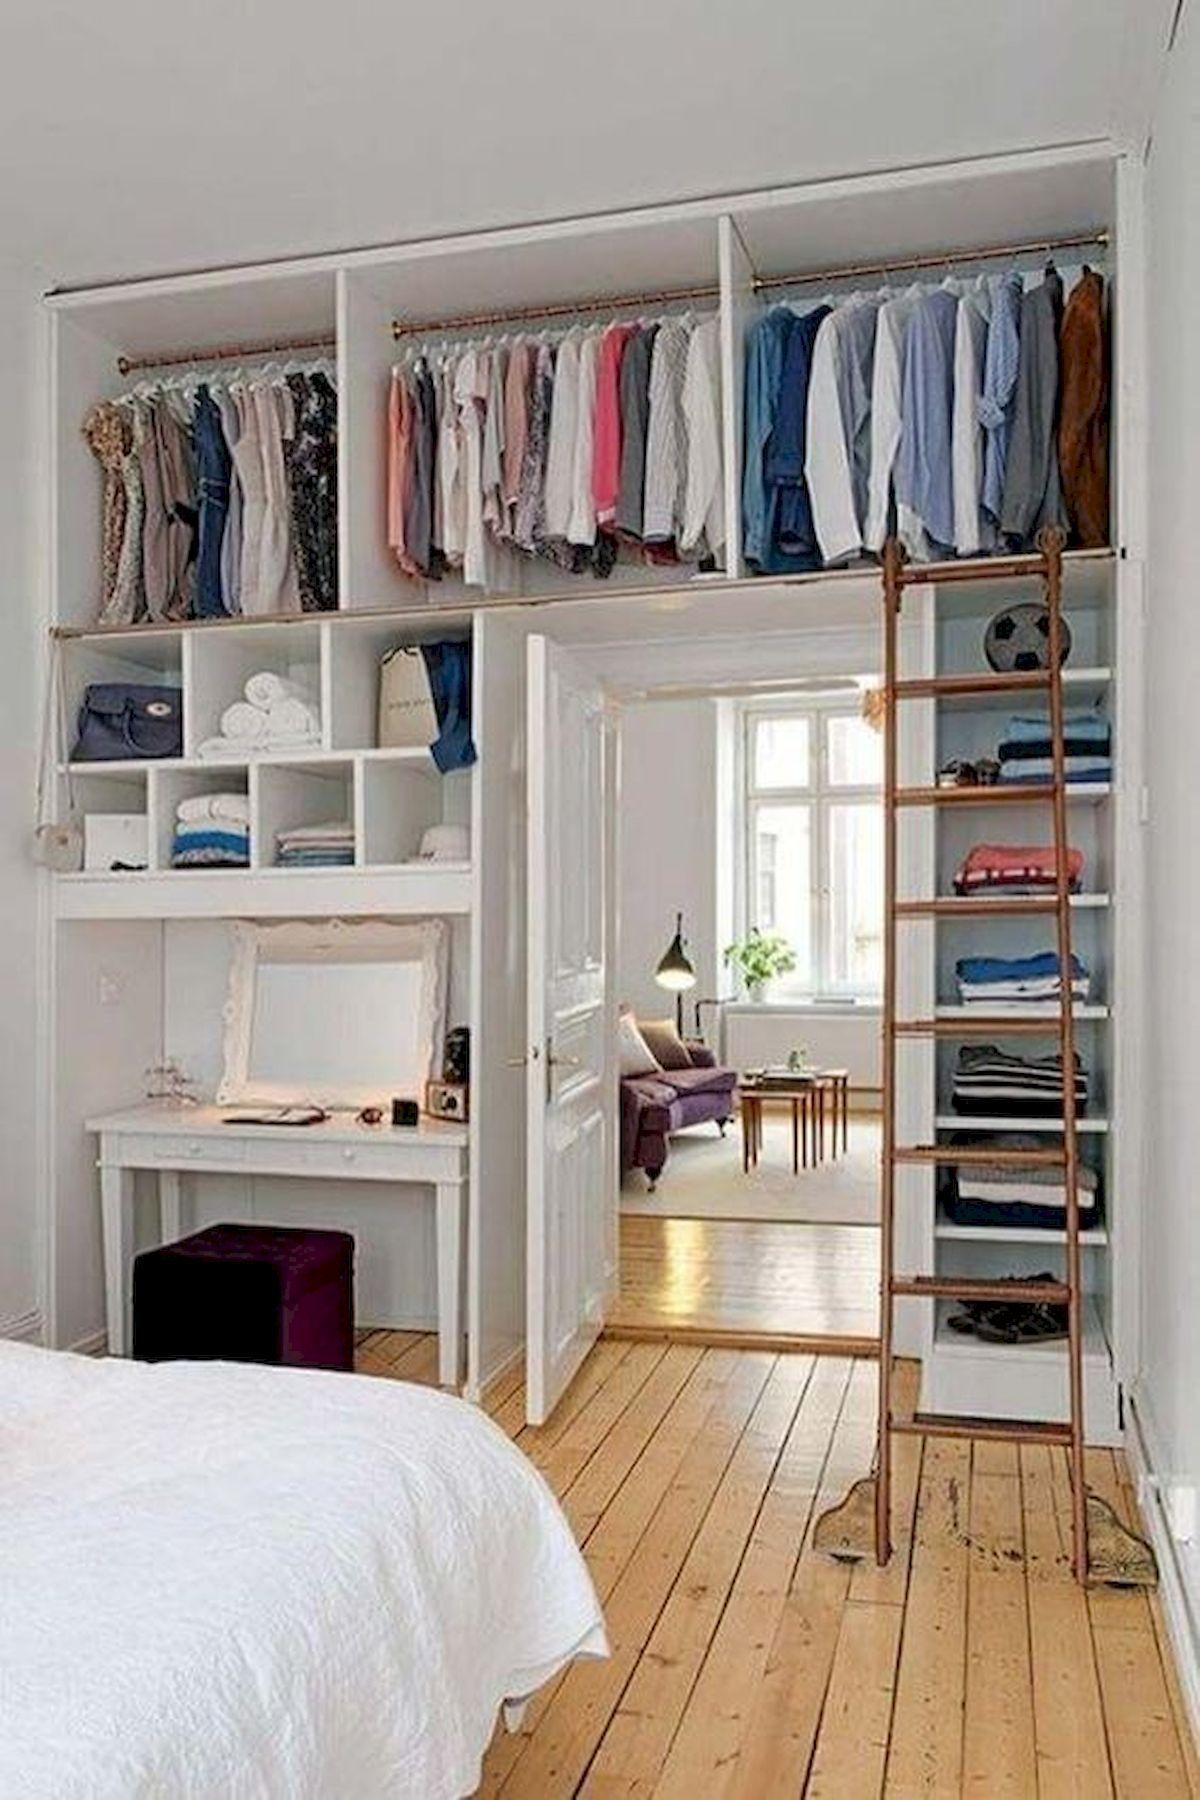 40 creative small apartment bedroom decor ideas tiny homes rv rh pinterest com